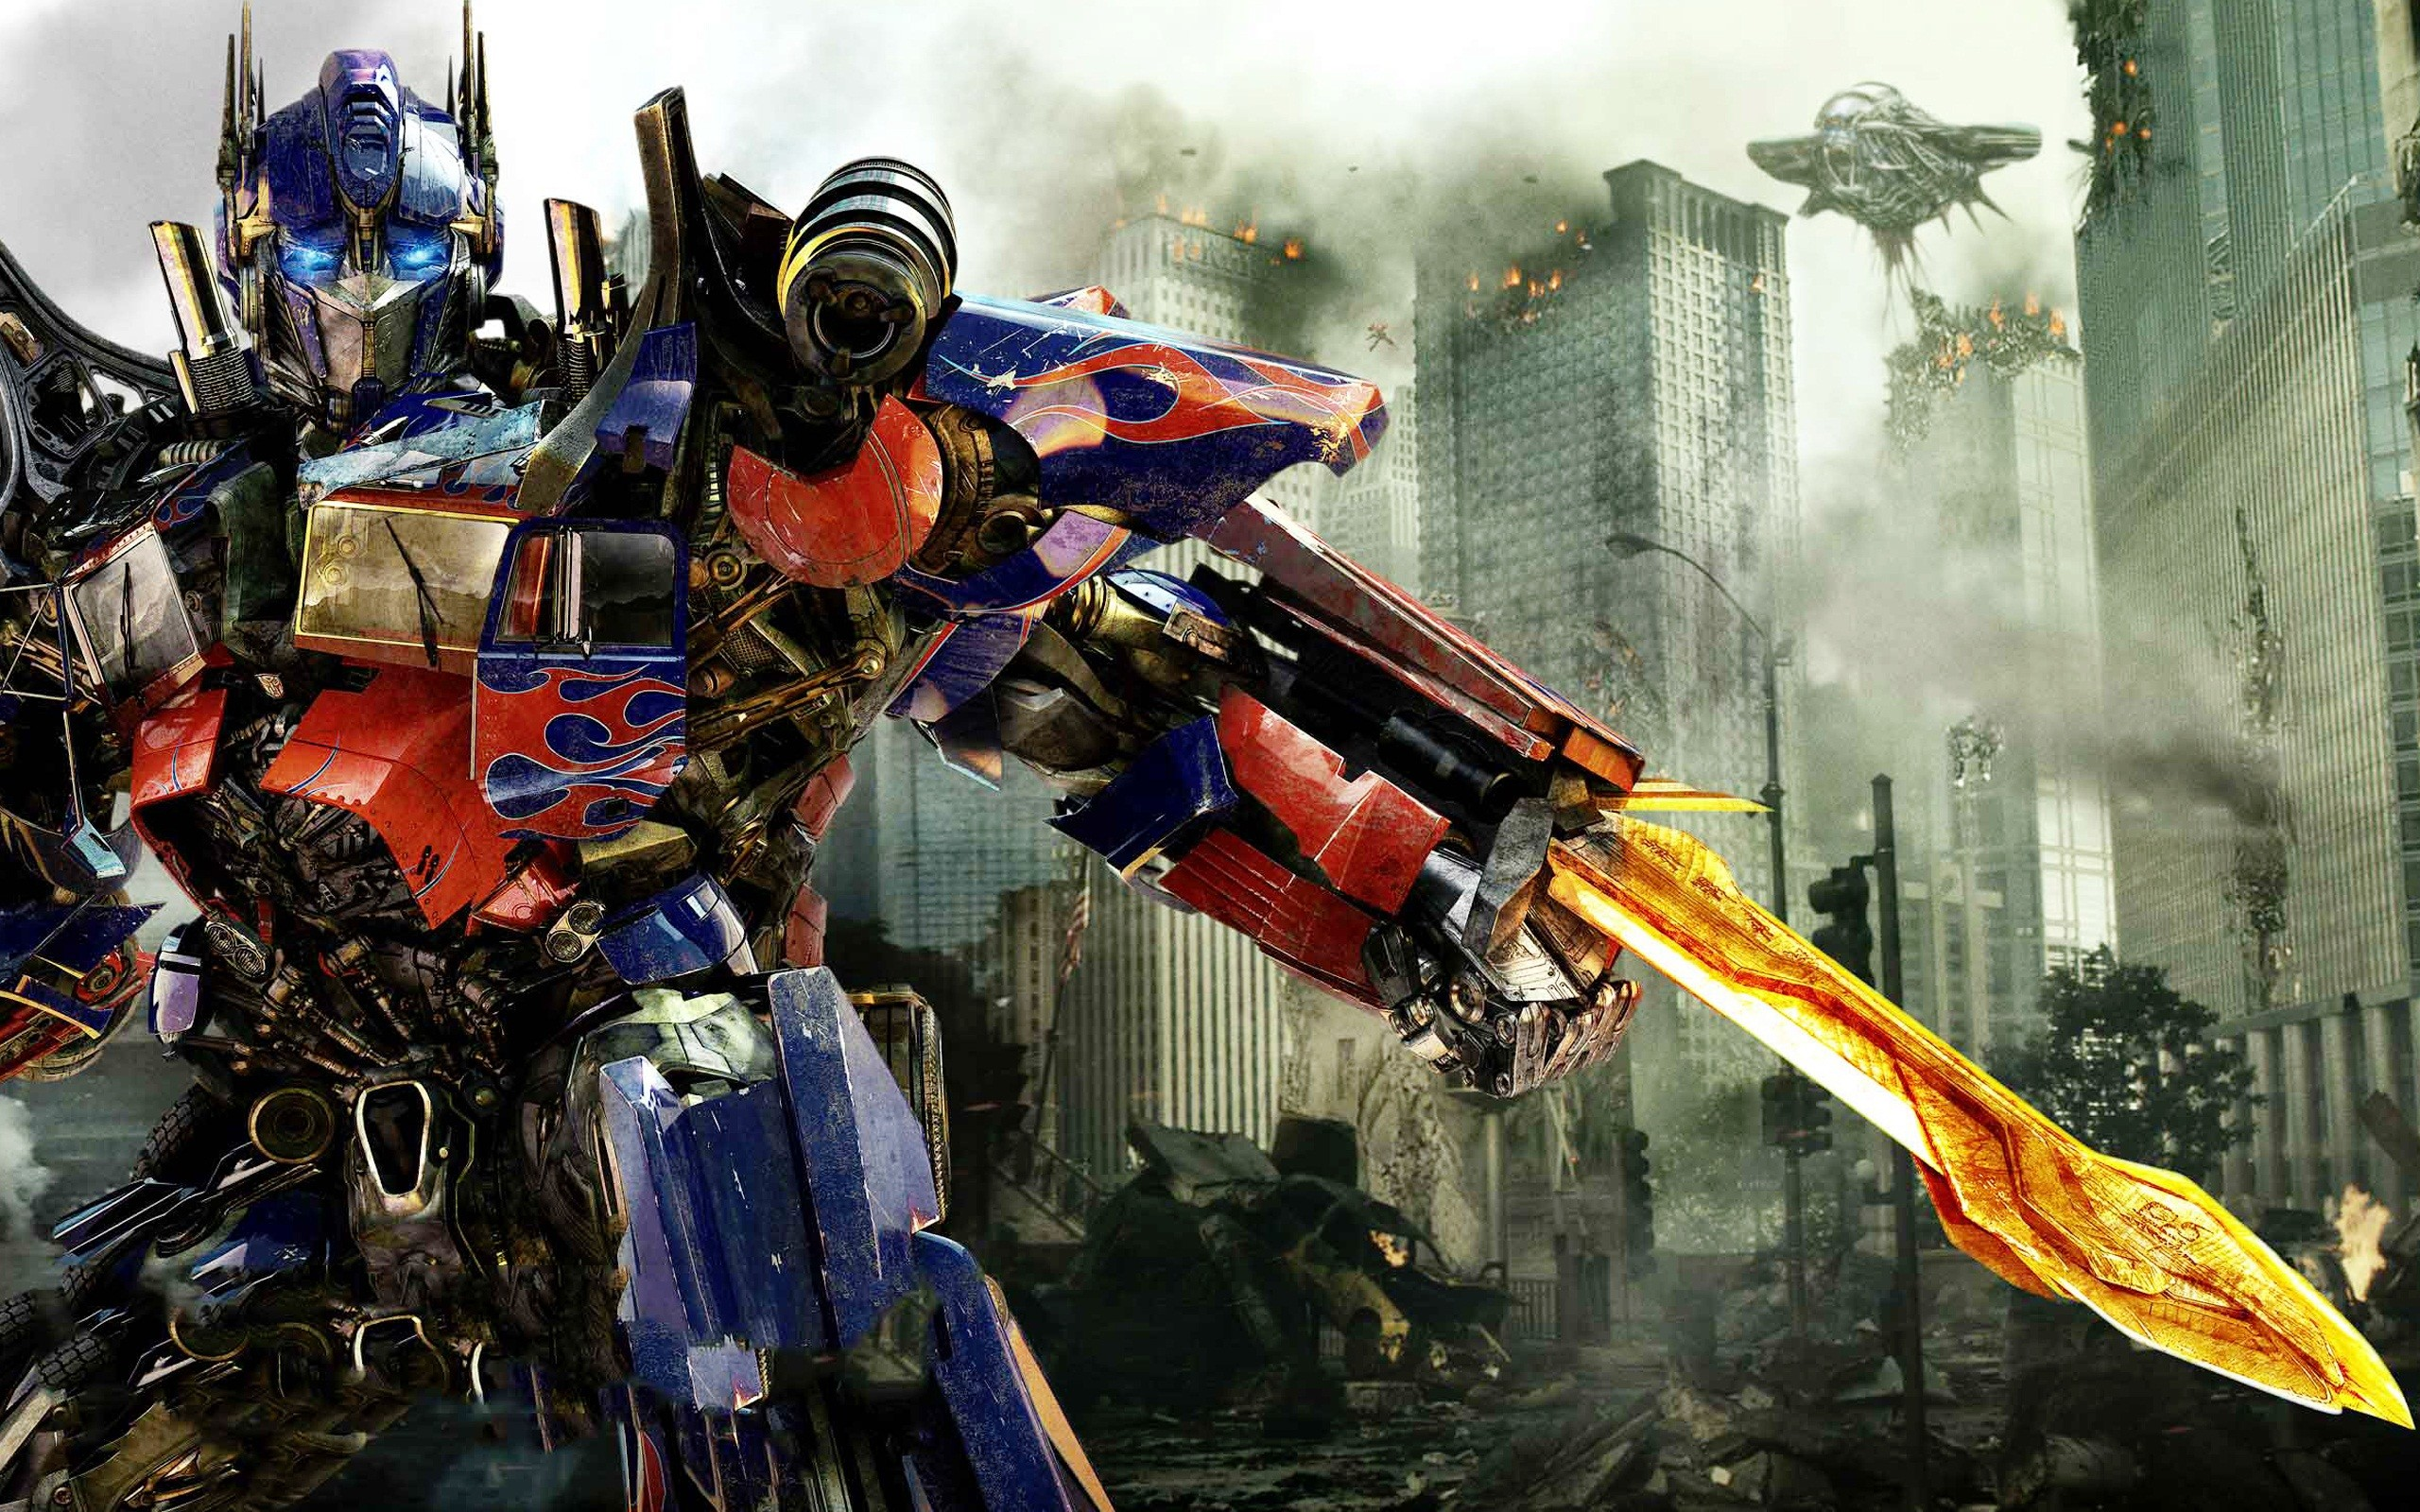 Optimus Prime in Transformers 3